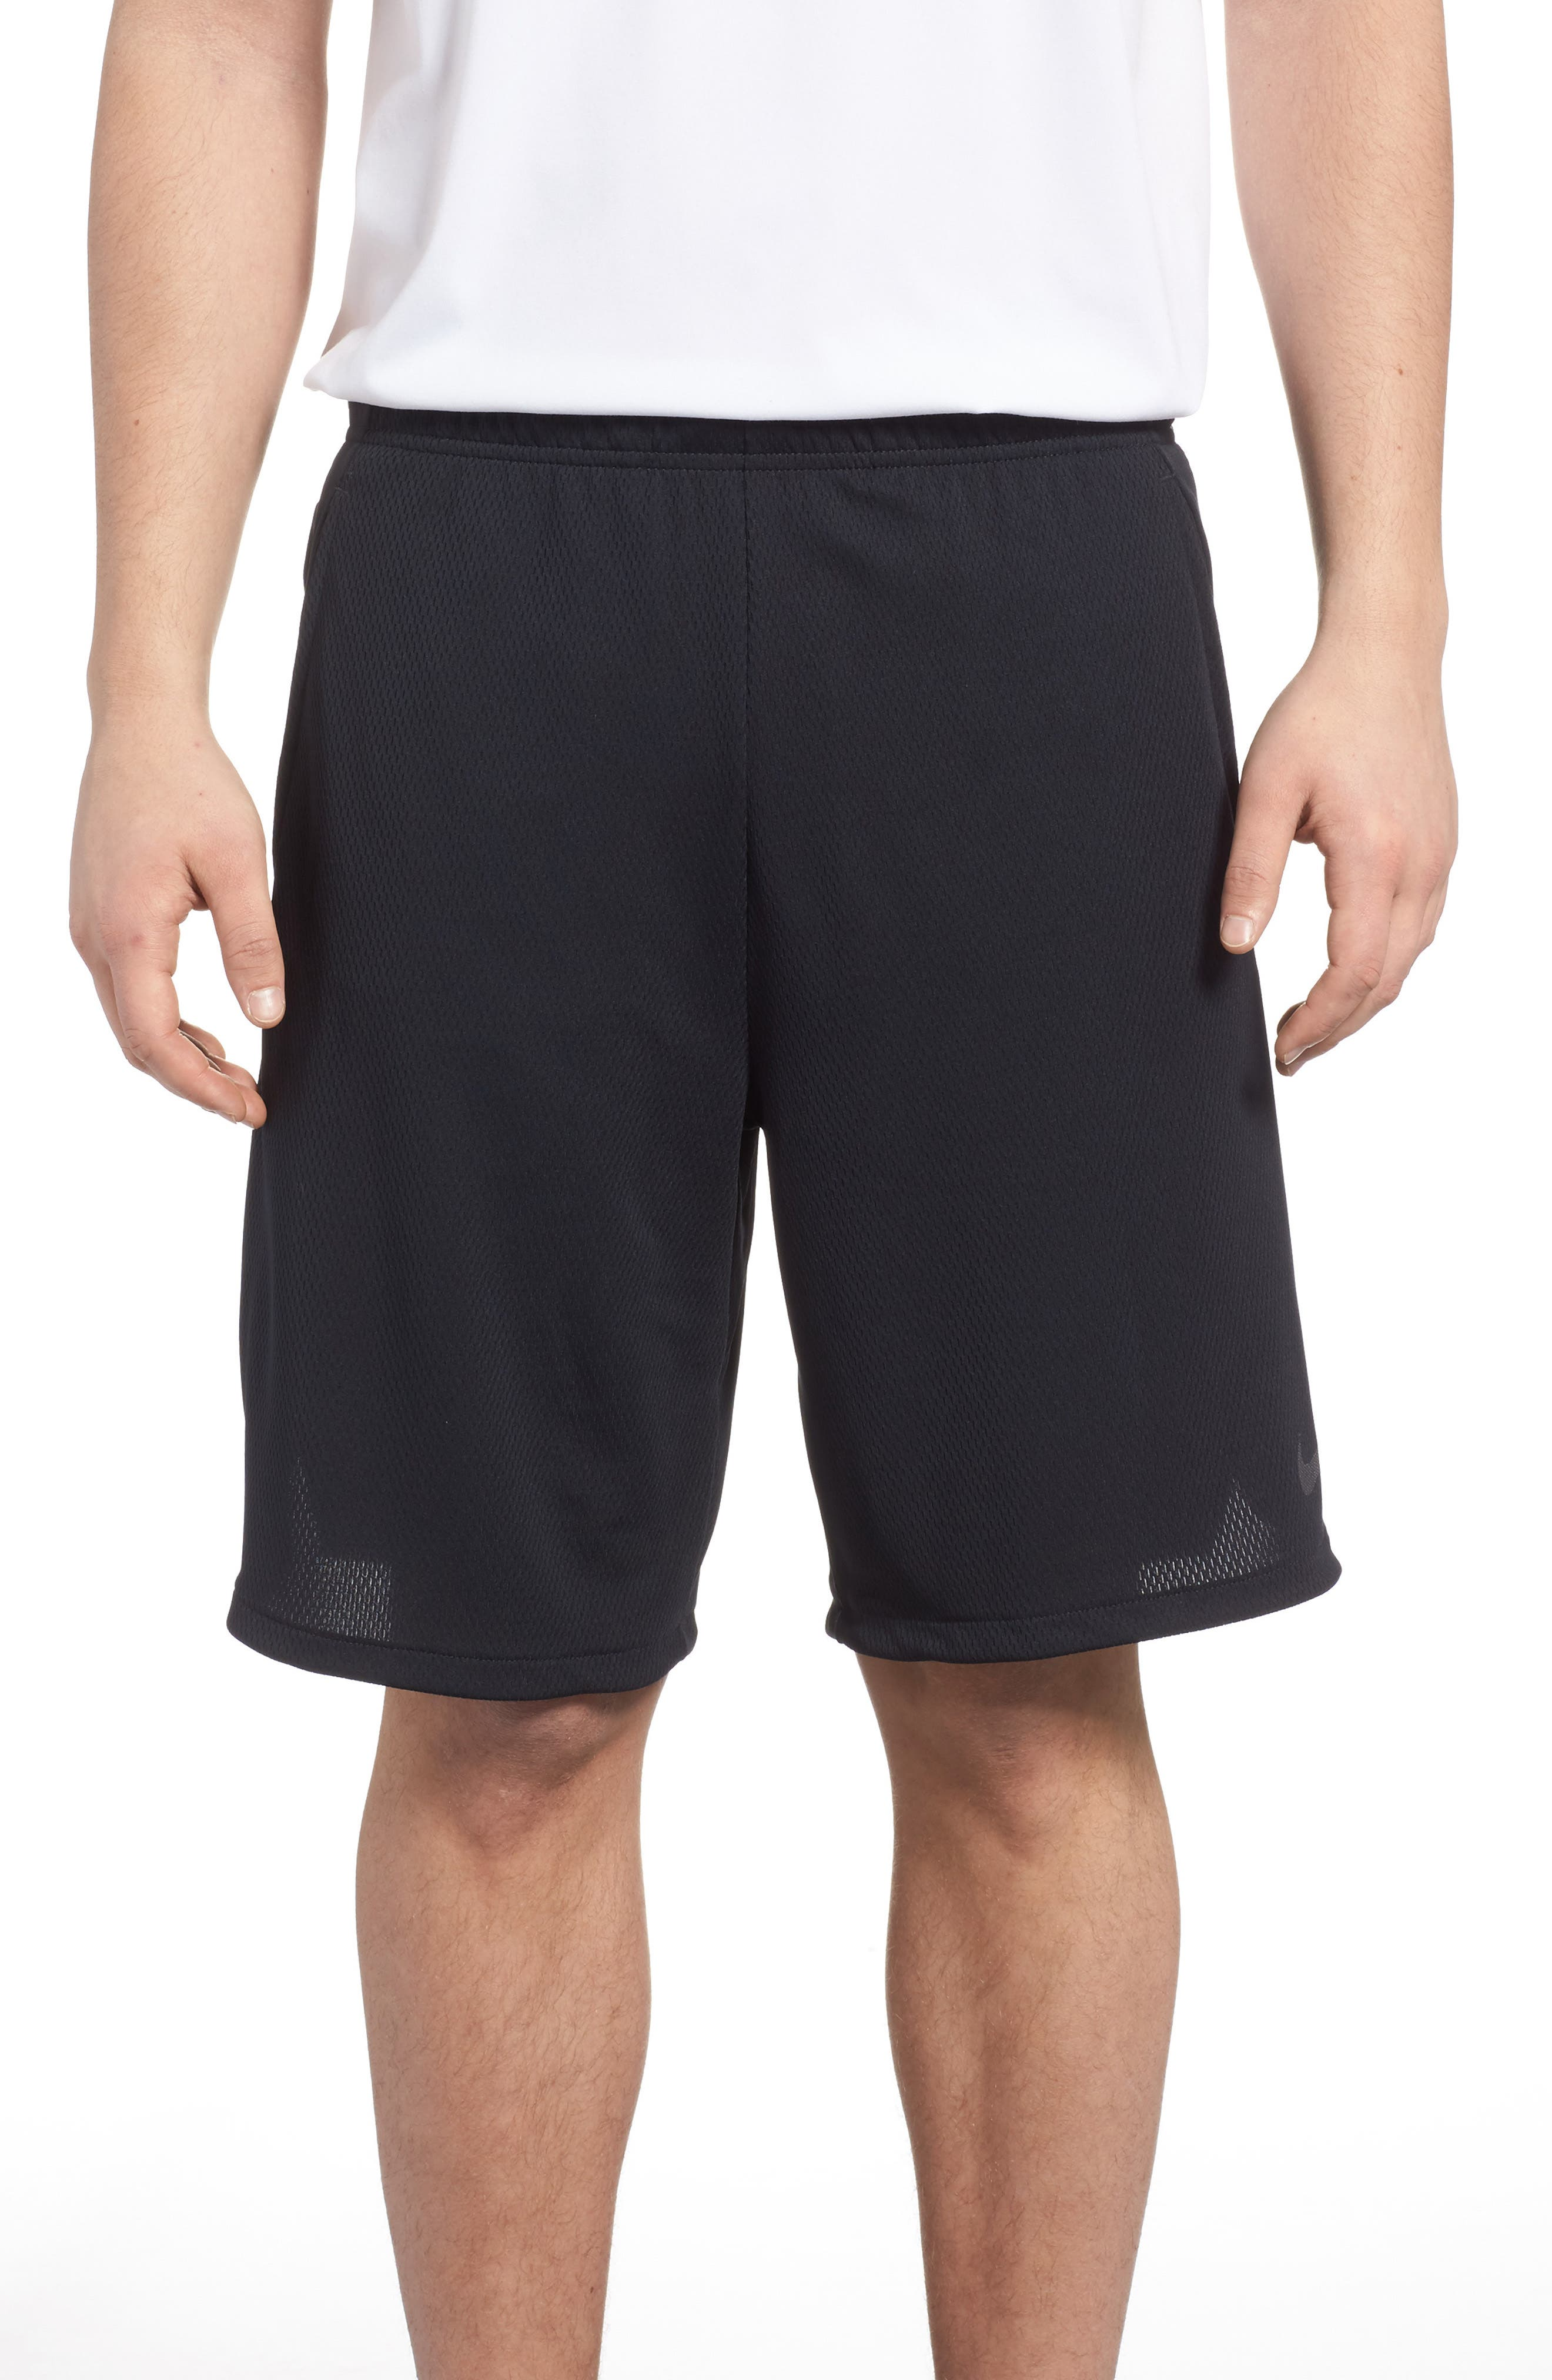 Training Dry 4.0 Shorts,                             Main thumbnail 1, color,                             010